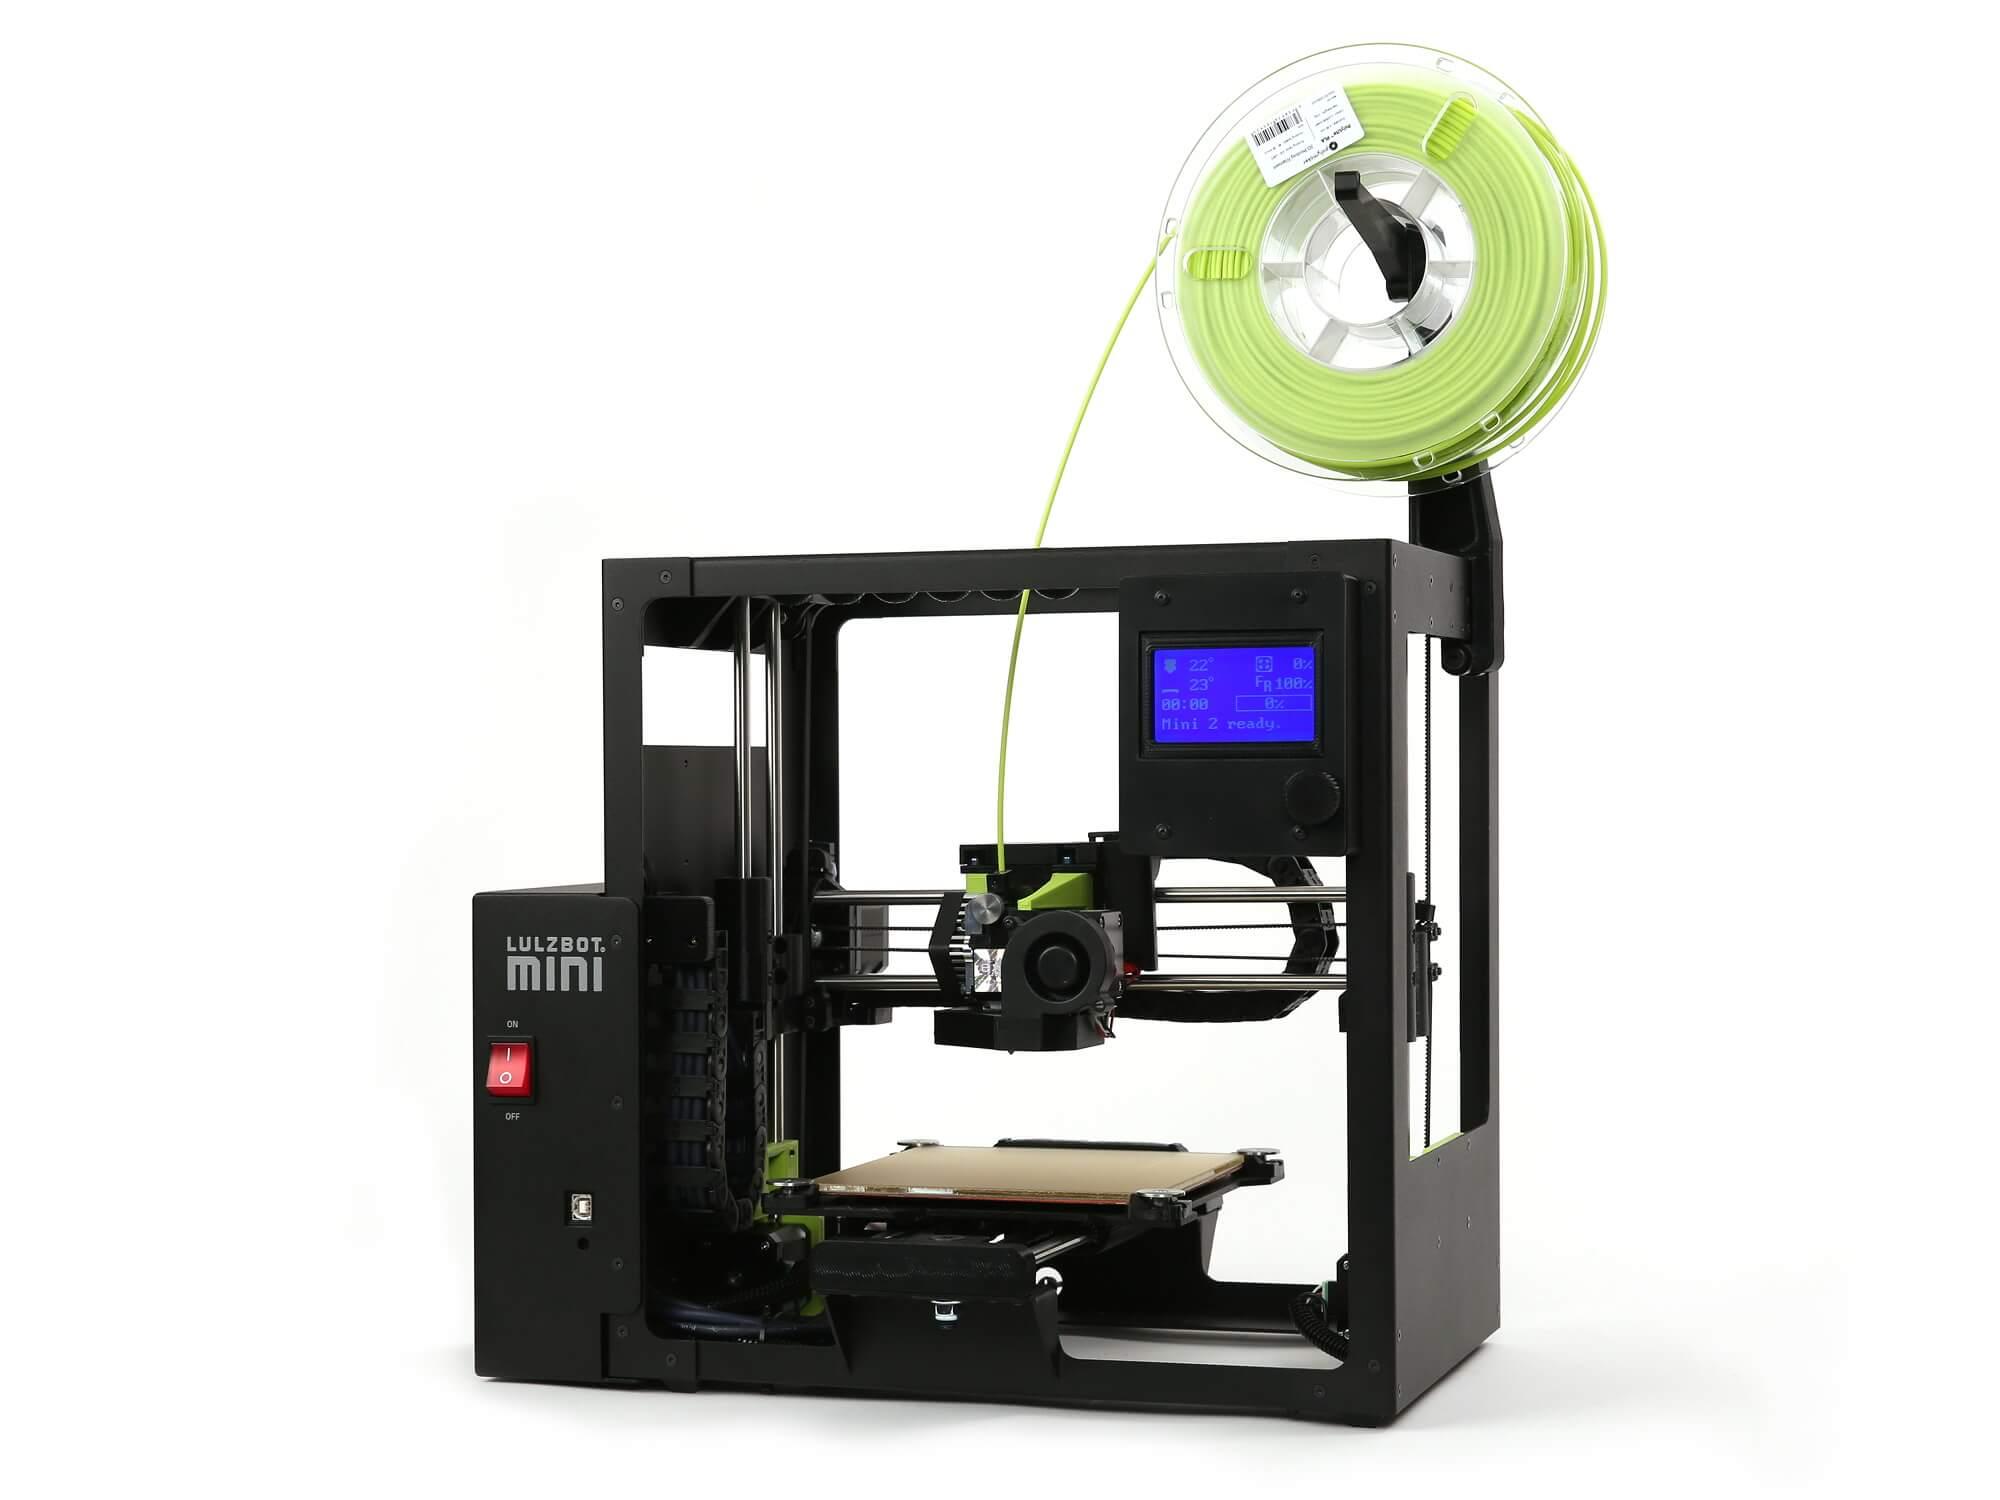 LulzBot Mini 23d printer